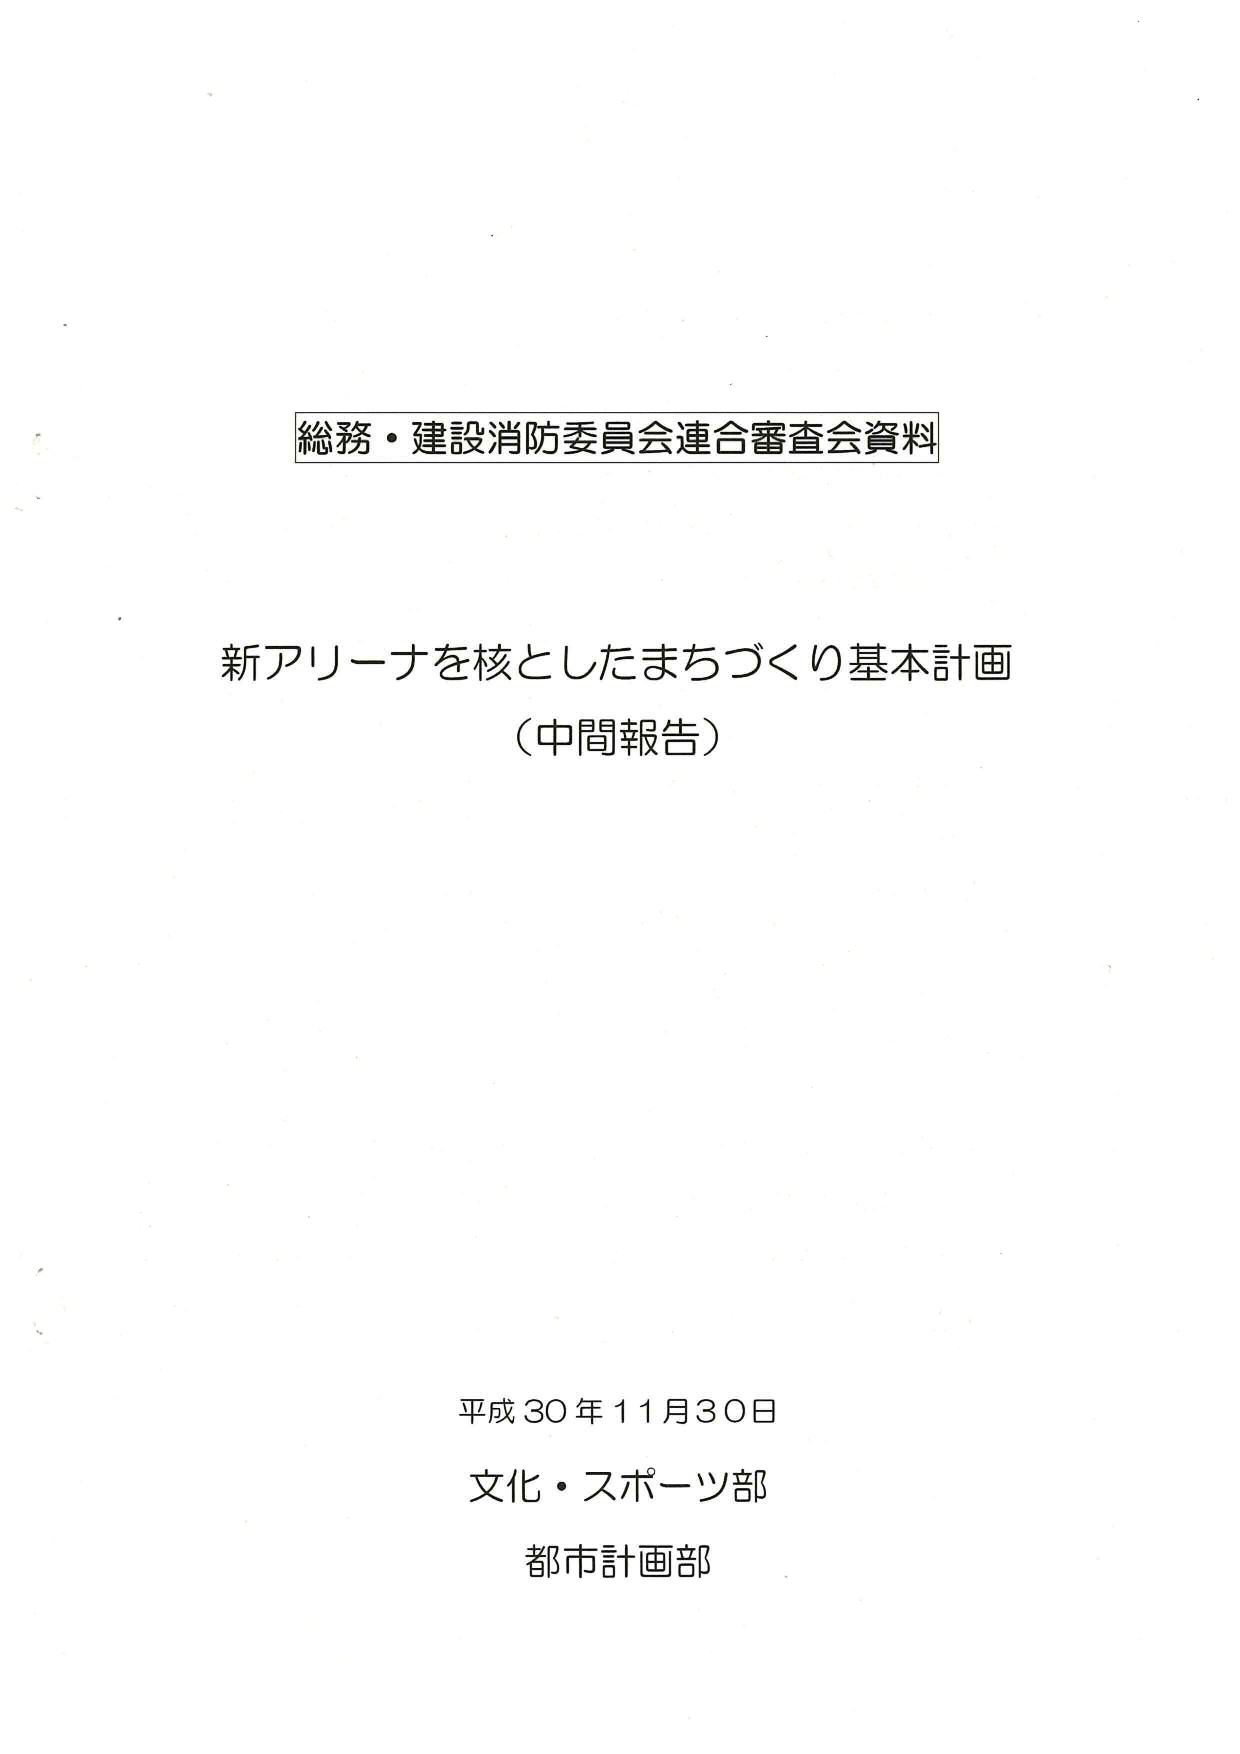 181201_01